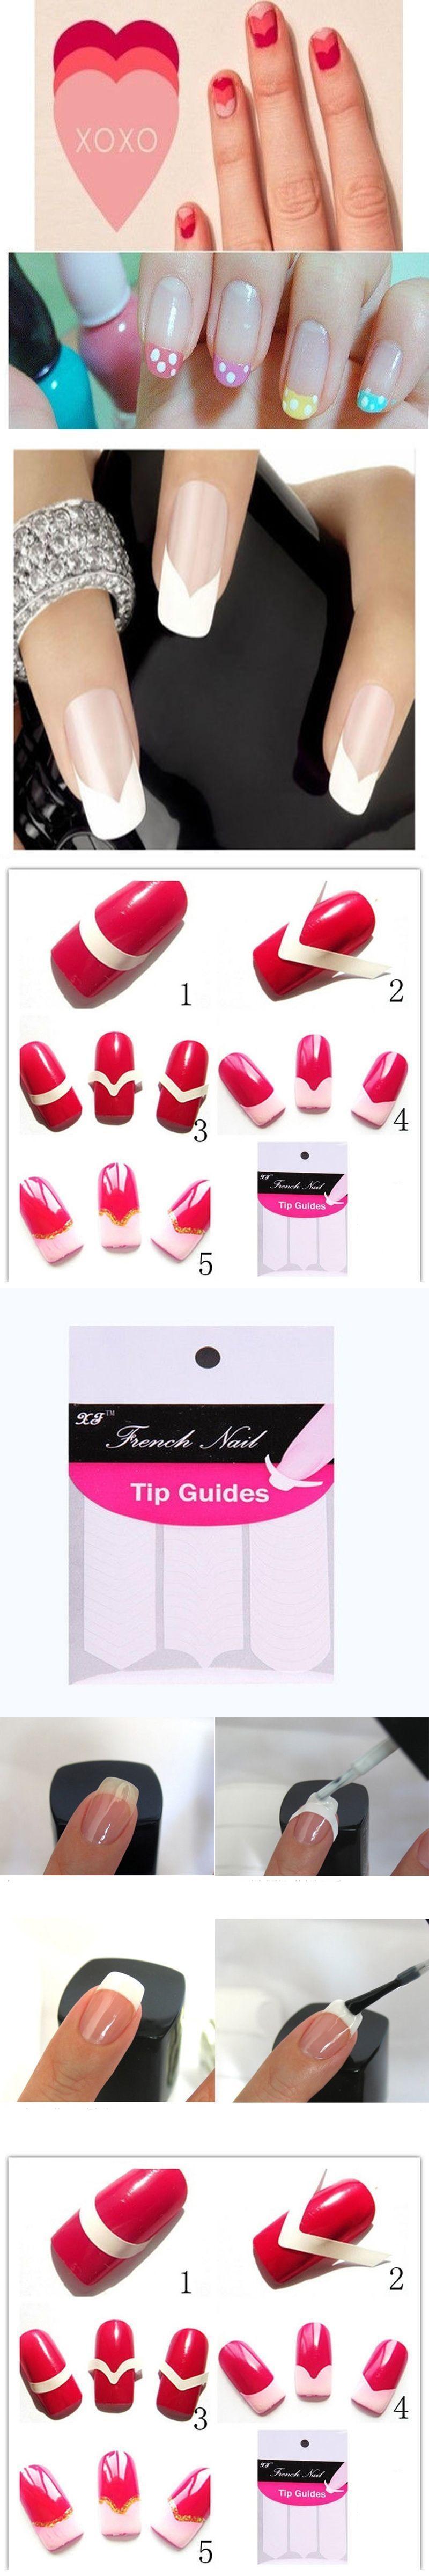 240PCS Portable Nail Art/ Fashion DIY Guides Stickers For Women Nail ...